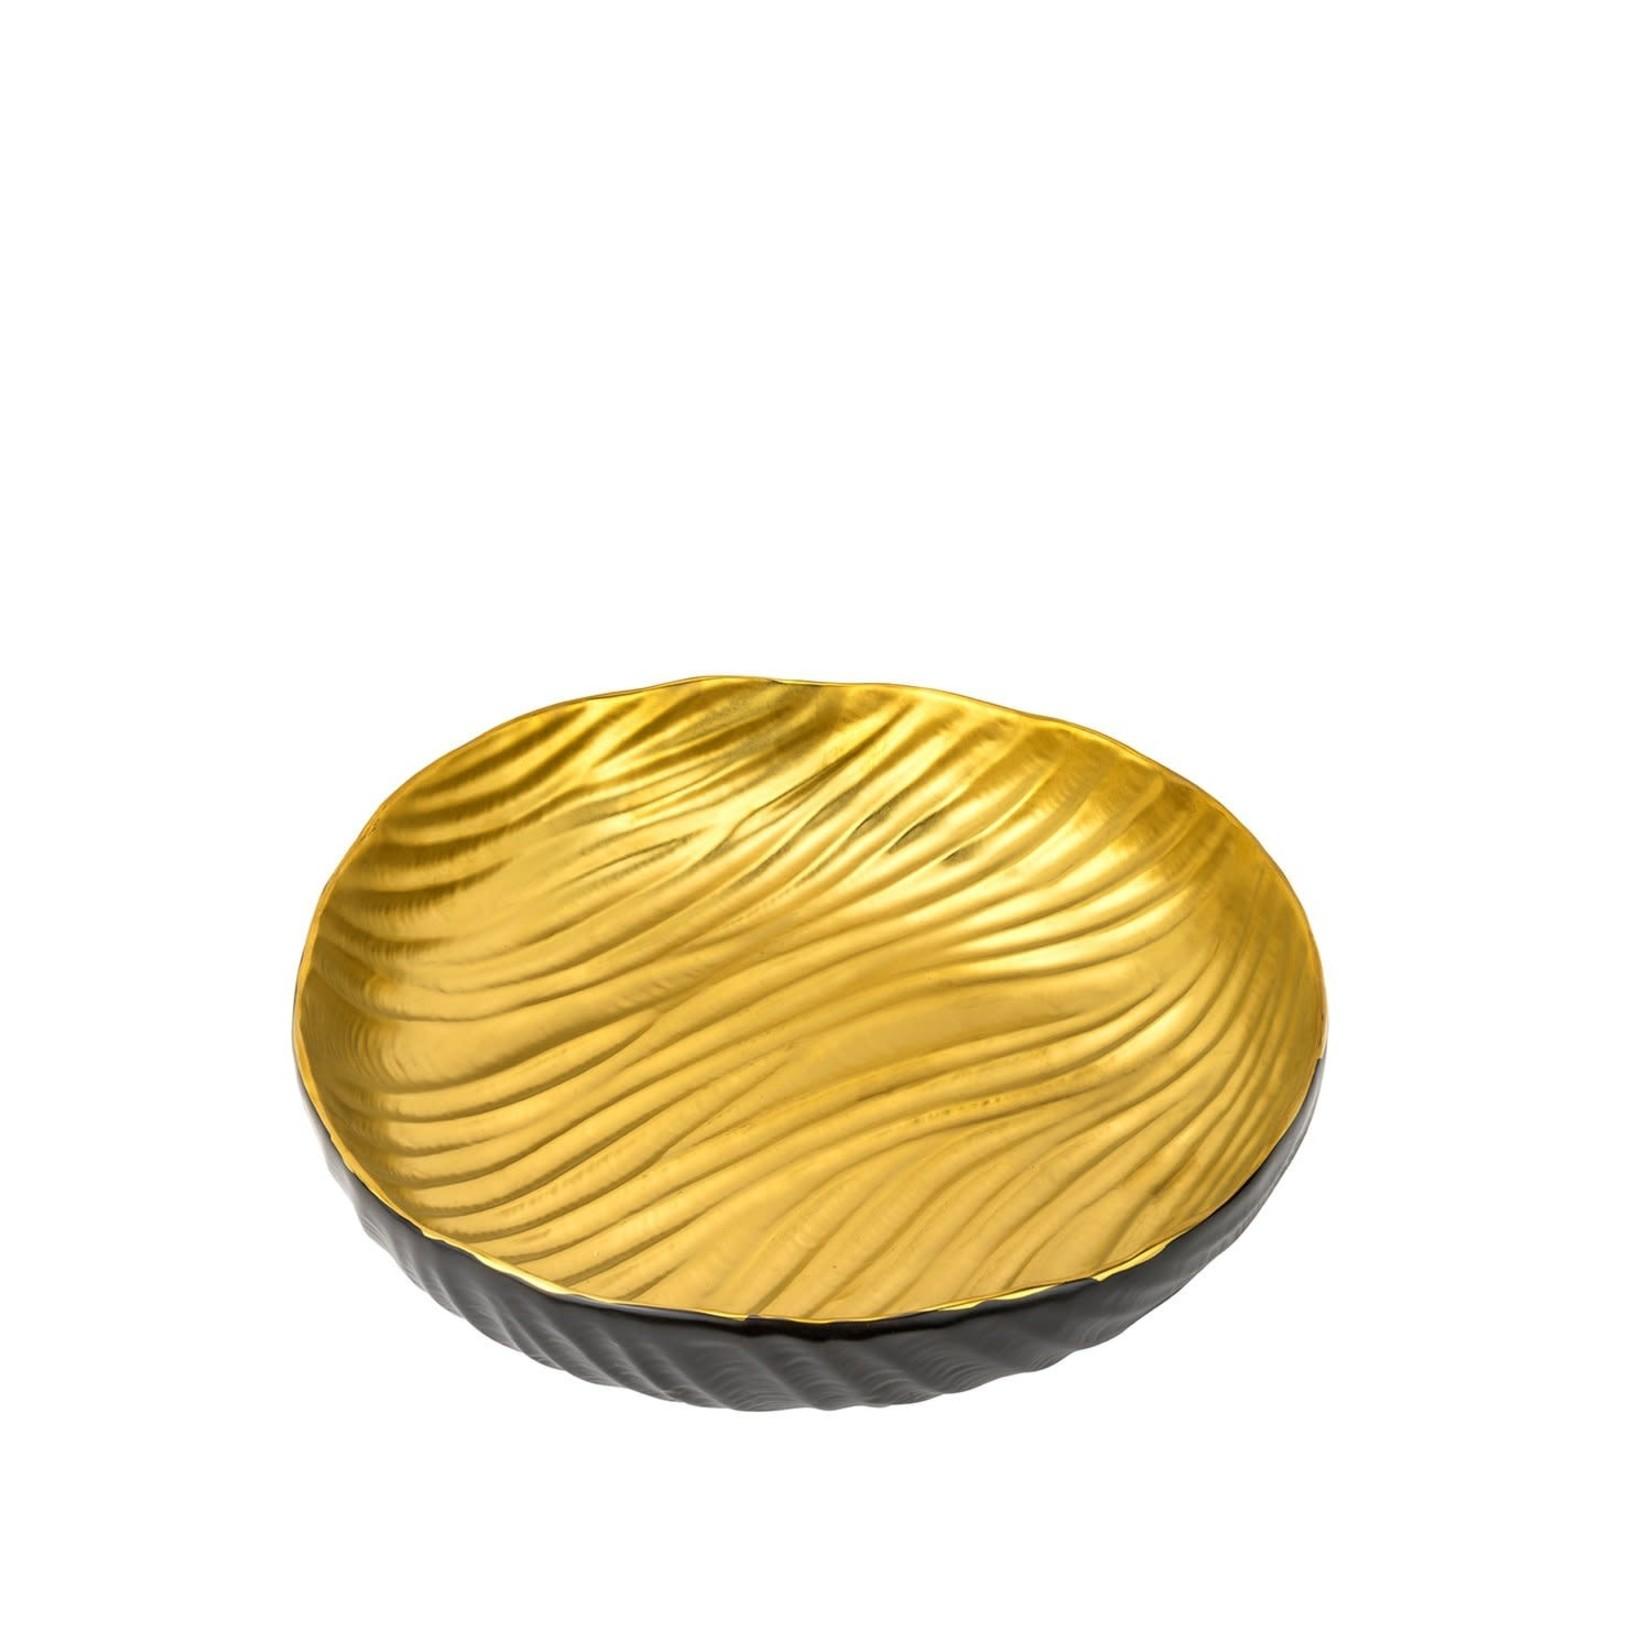 044 Large Black/Gold Bowl